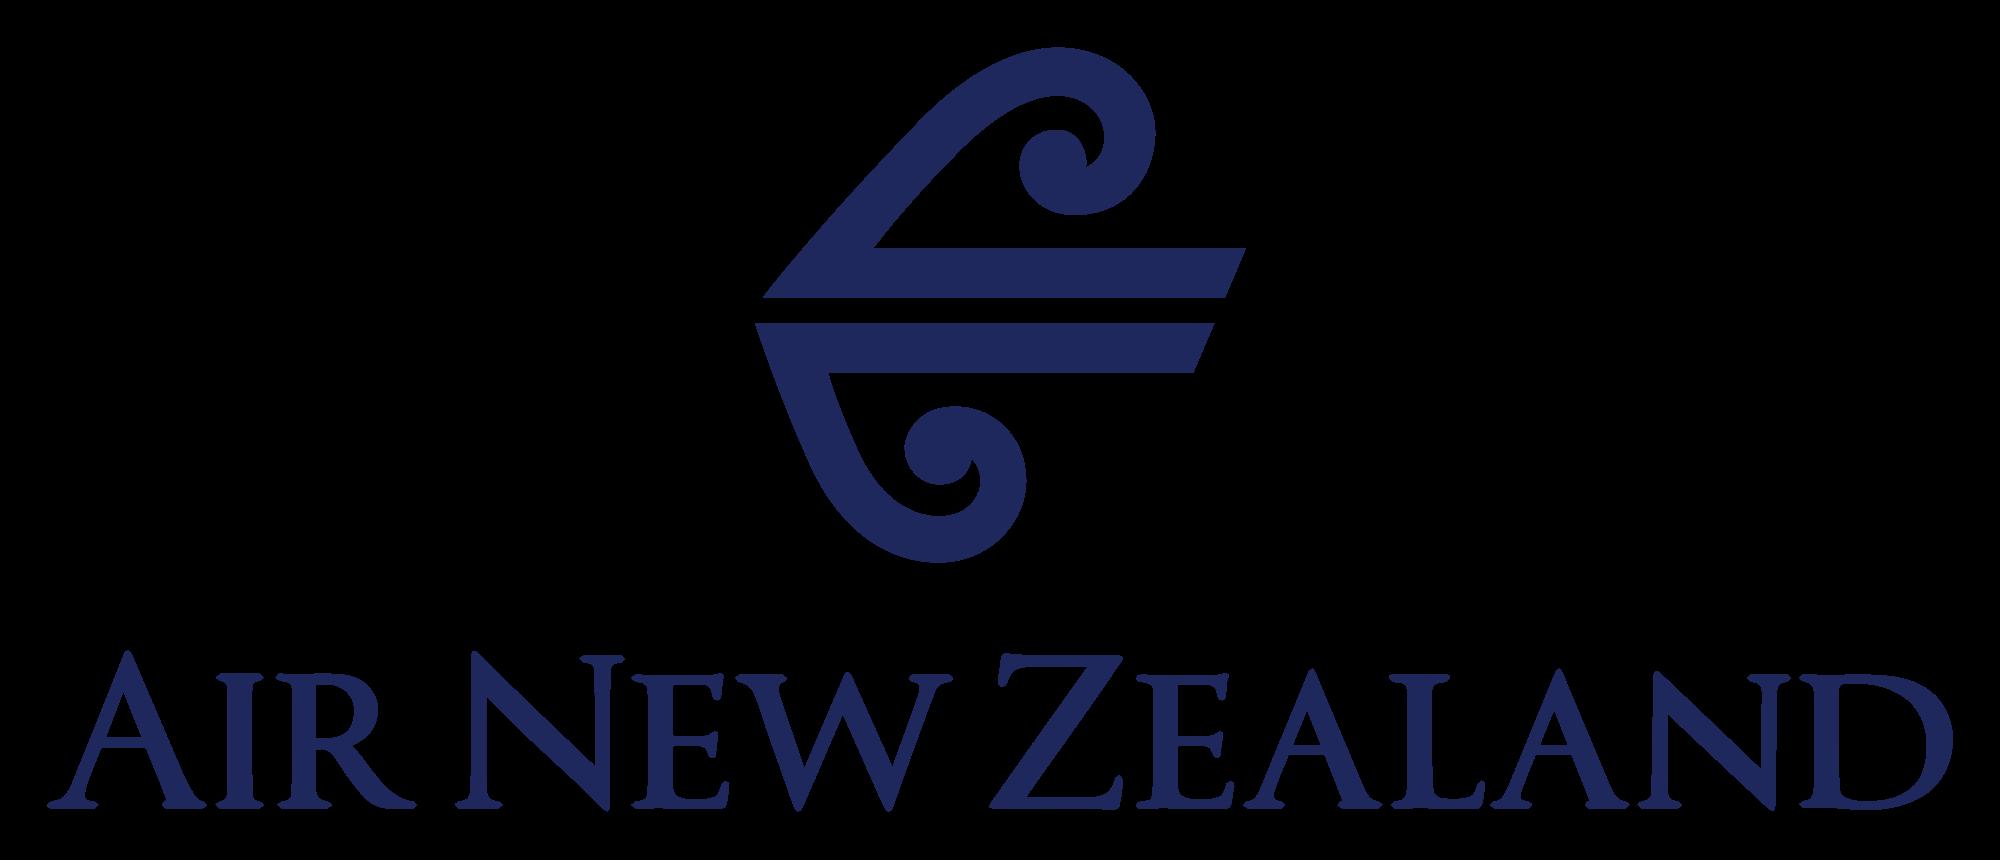 air_newzealand-logo-svg. Air New Zealand pitches media - Air New Zealand PNG